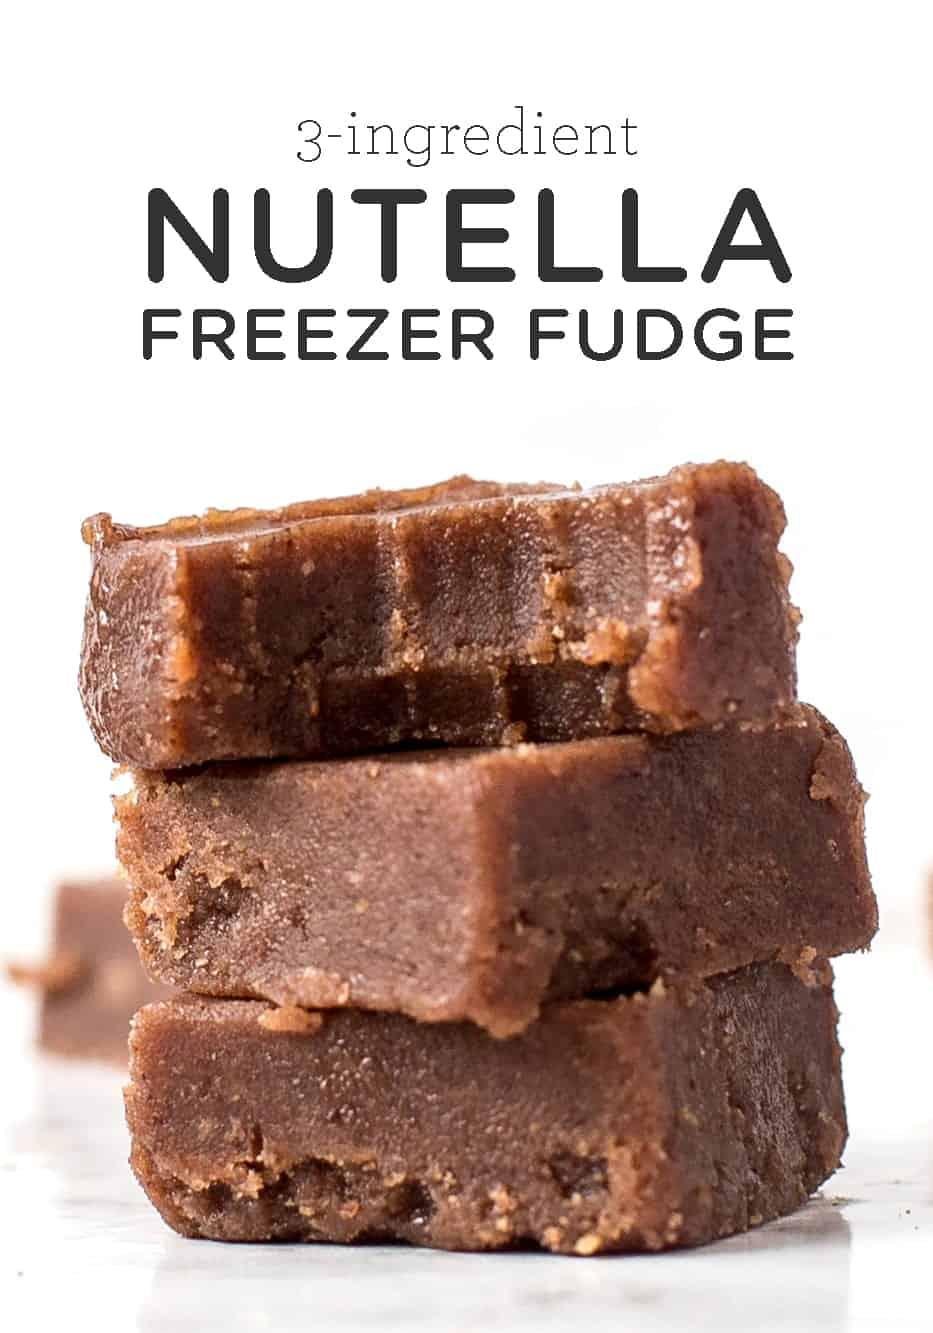 How to Make Nutella Freezer Fudge | Using 3 Ingredients - Simply Quinoa